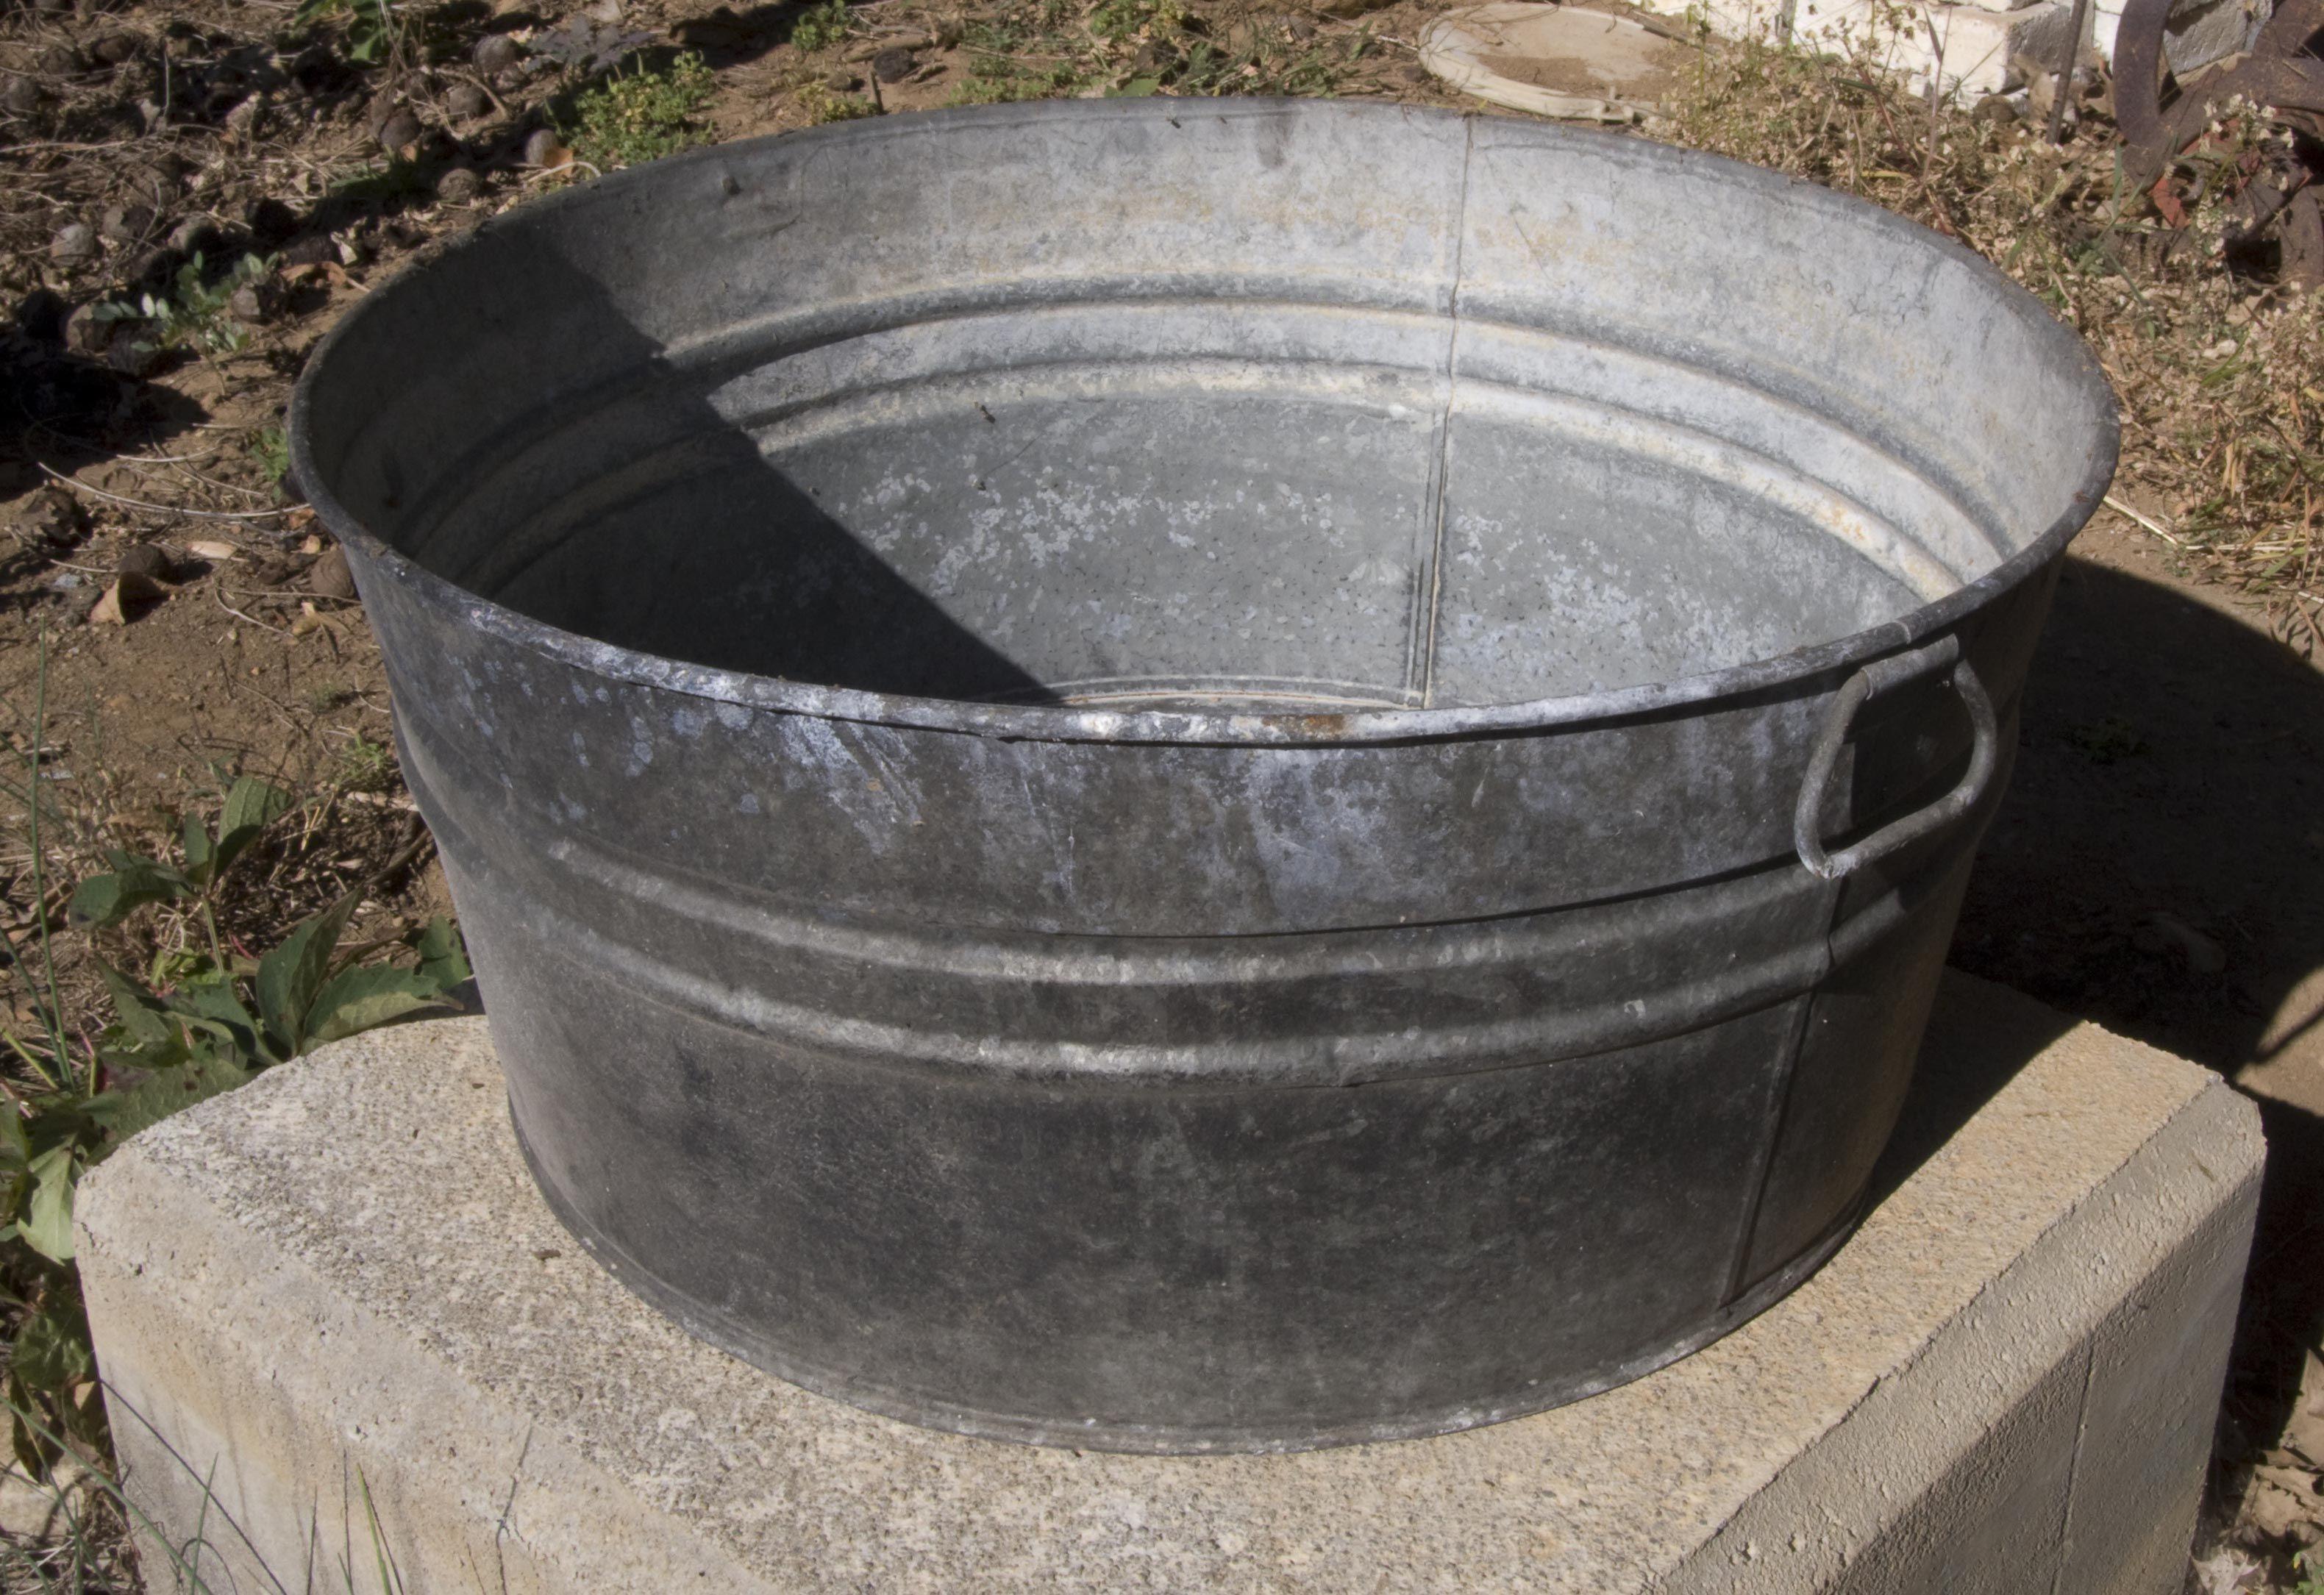 Washtub11 Jpg Jpeg Image 3160x2169 Pixels Scaled 33 Wash Tubs Old Fashioned Bathtub Tub